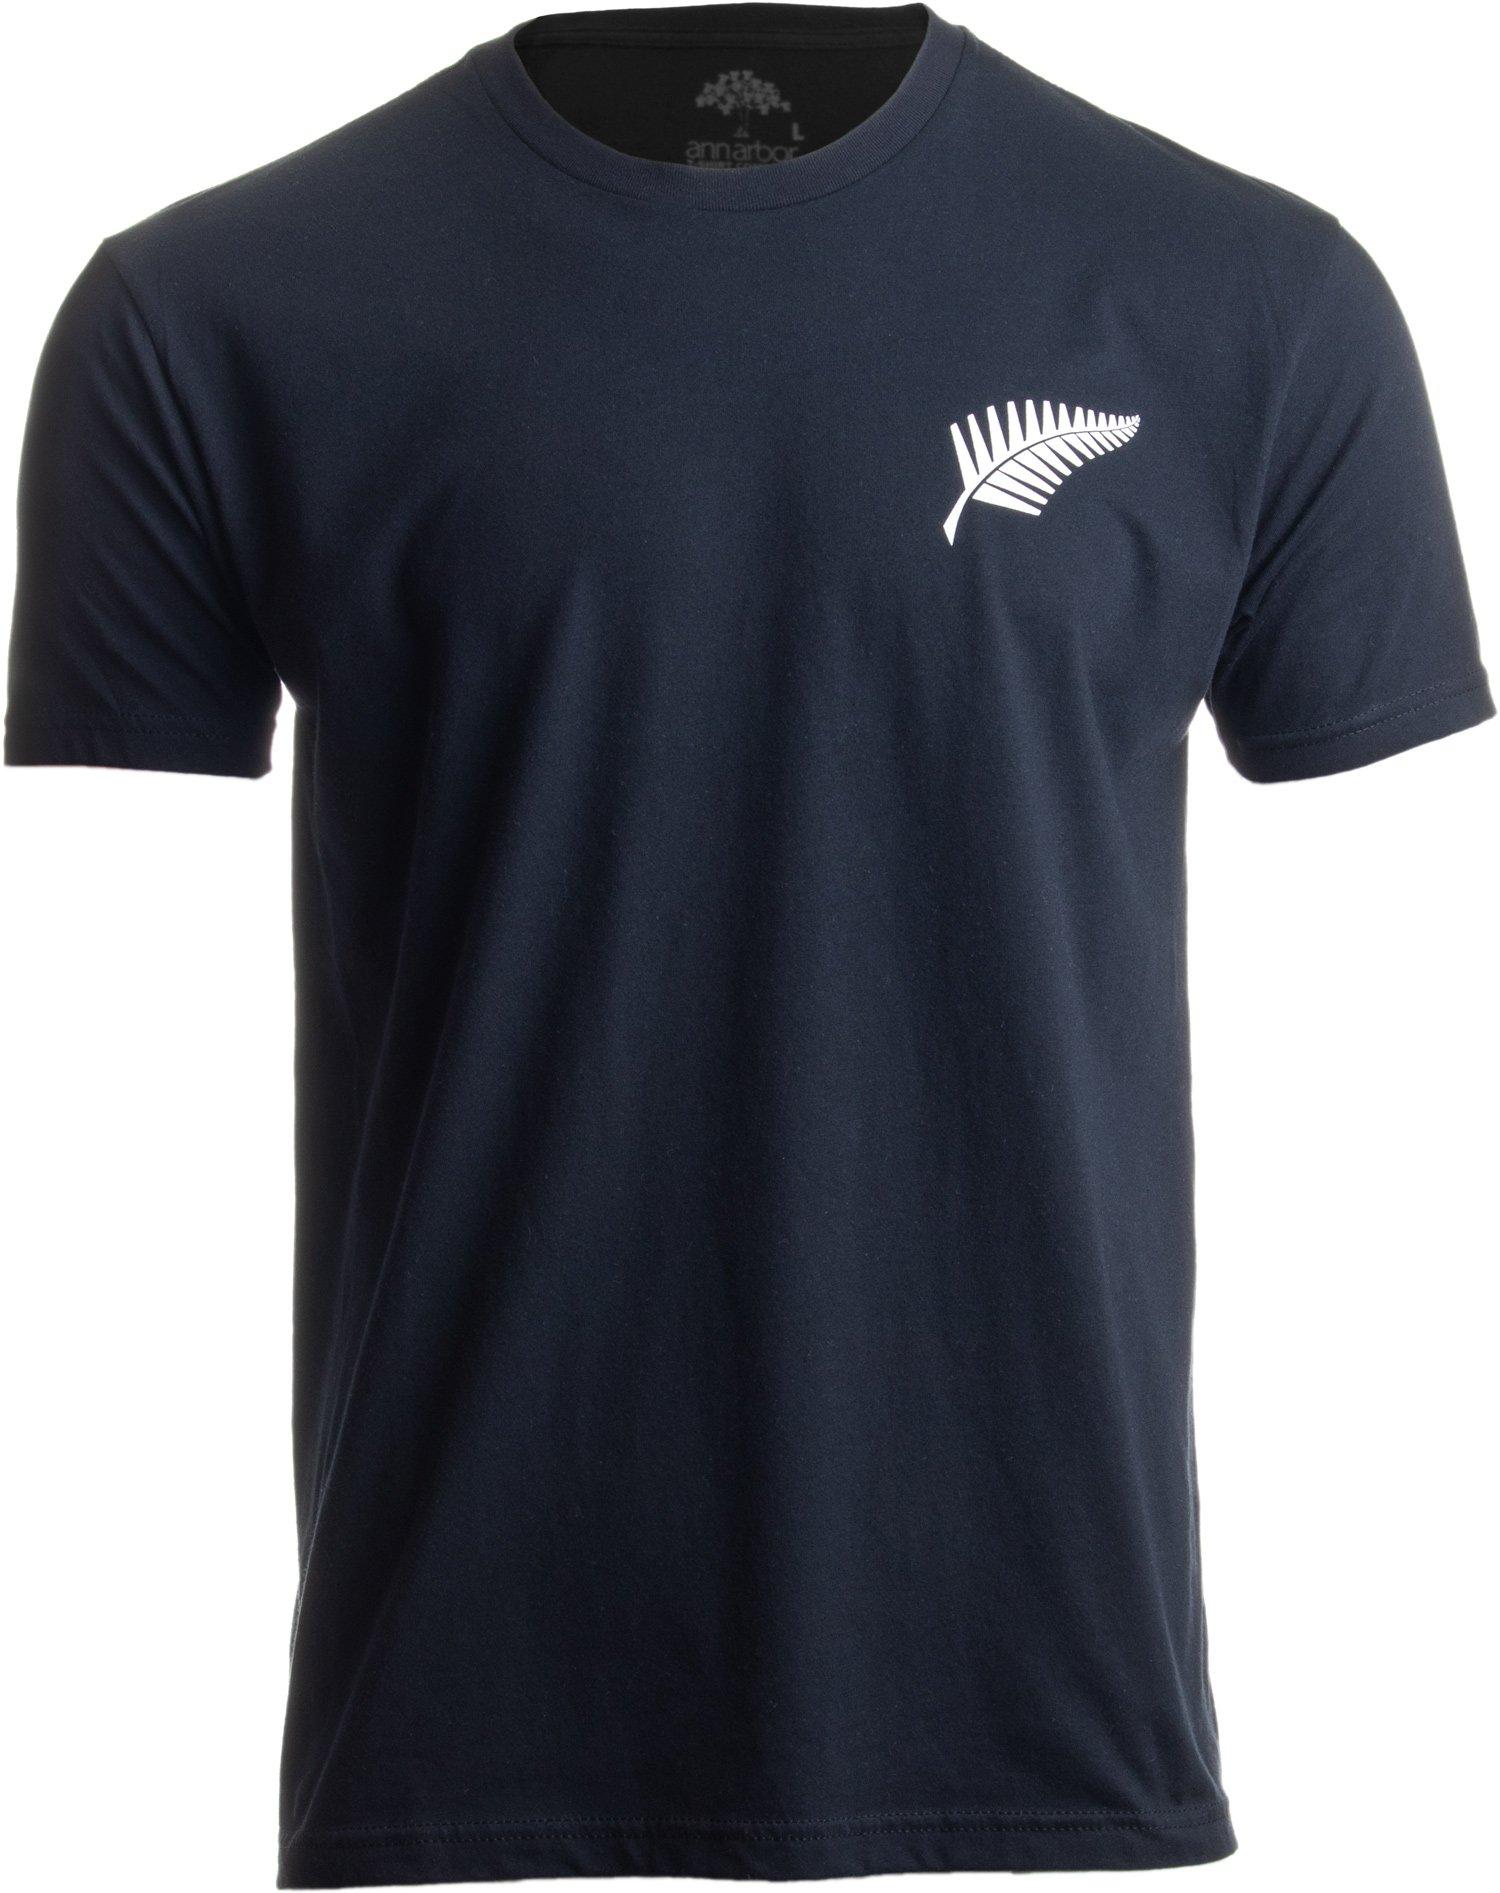 New Zealand Pride   Kiwi Silver Fern Southern Cross Men Women Black T-Shirt